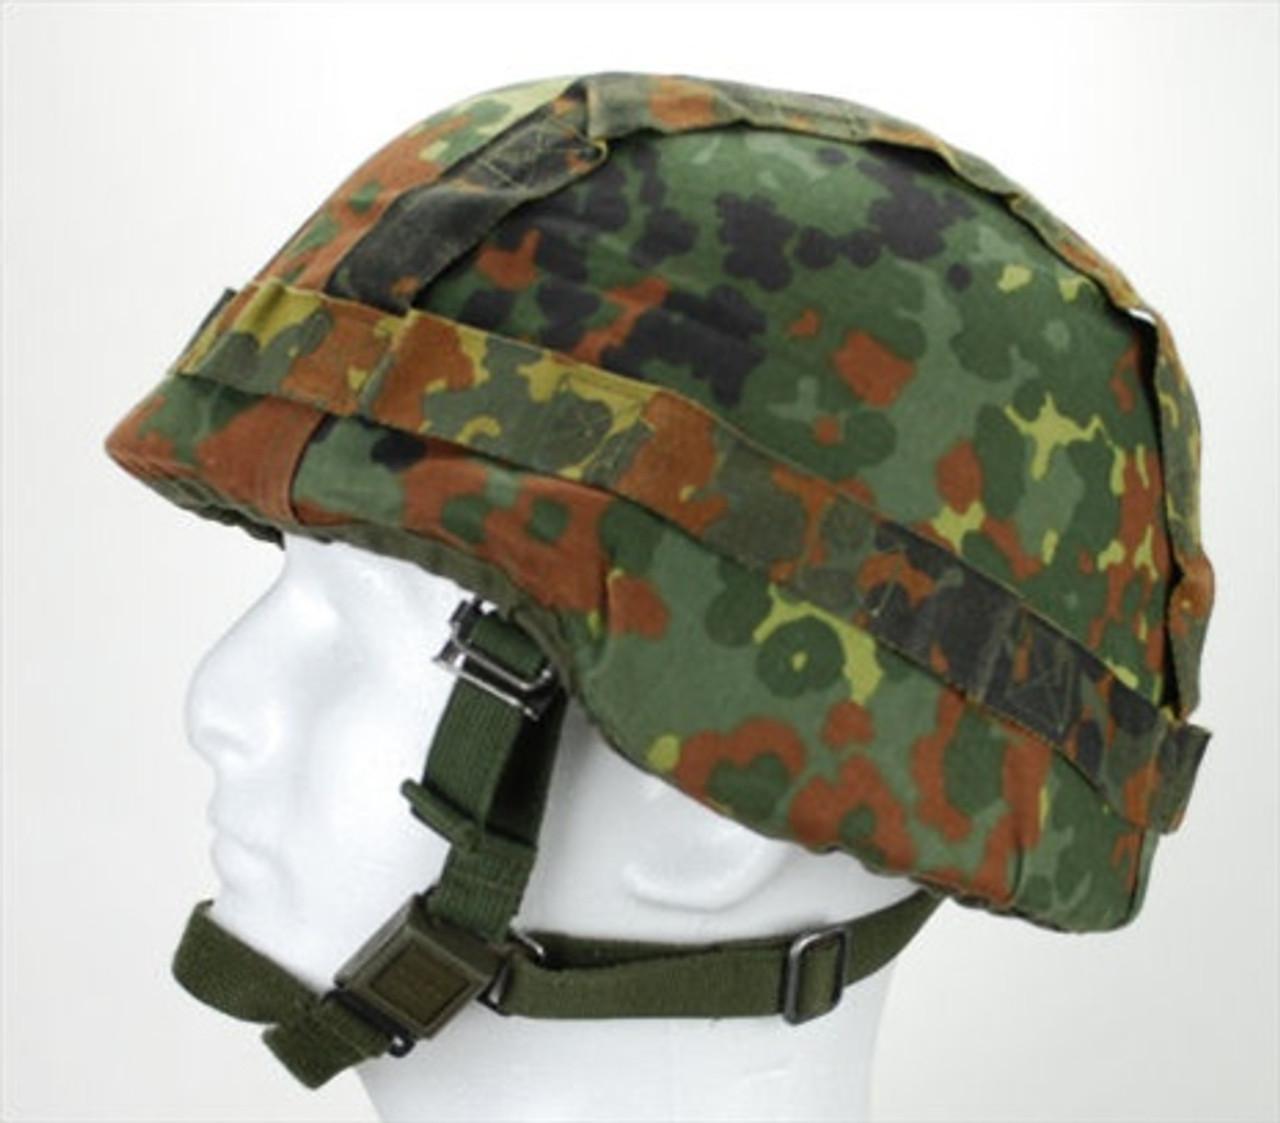 Bundeswehr Flecktarn Helmet Cover from Hessen Antique